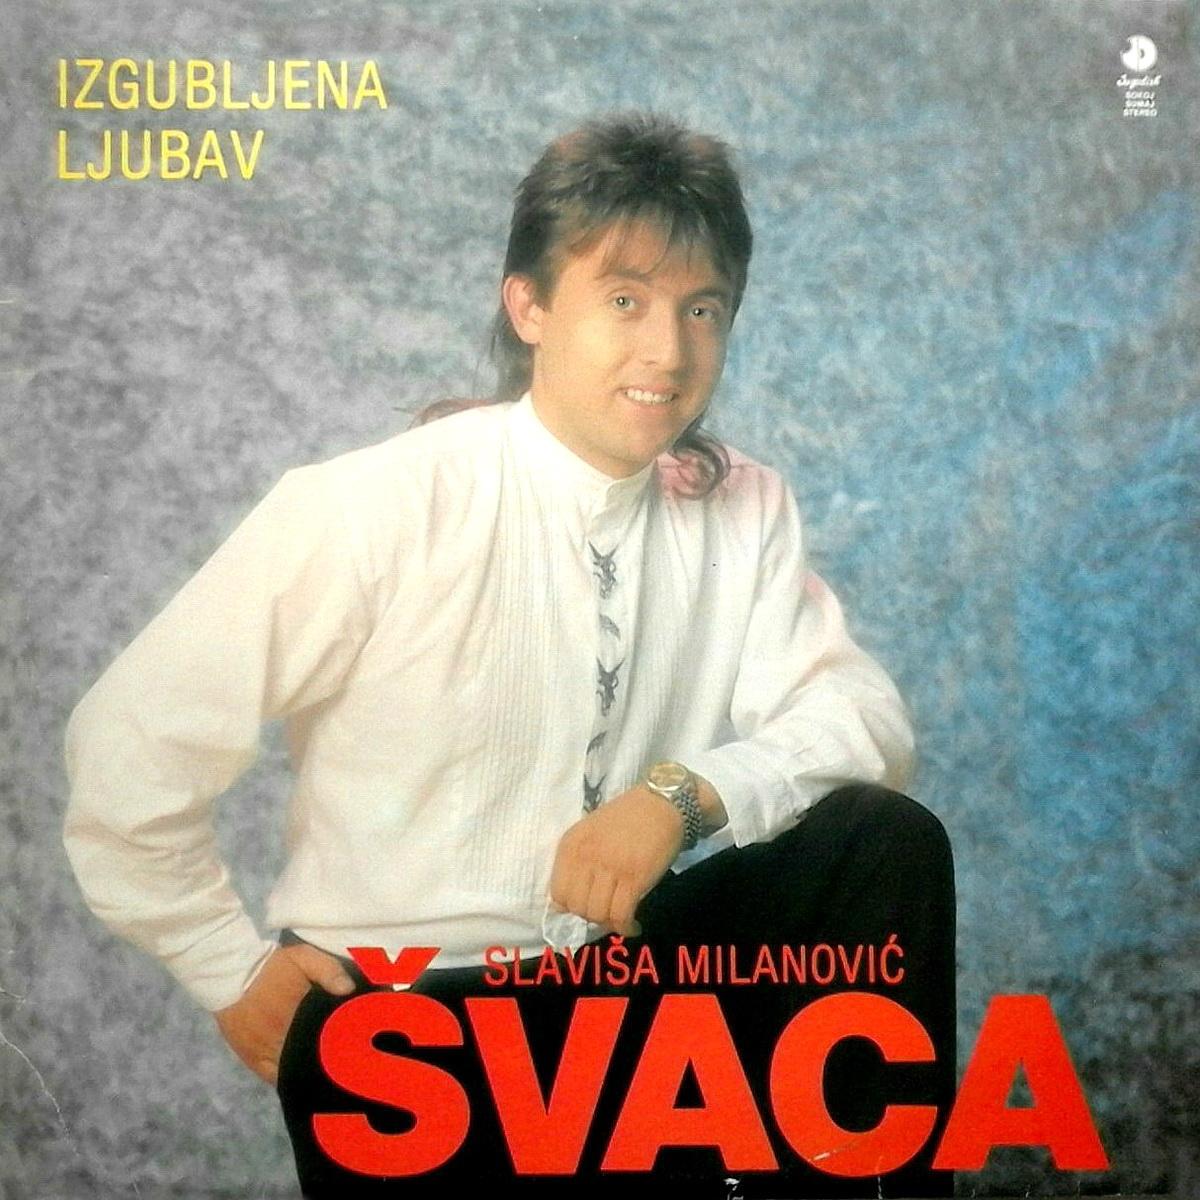 Slavisa Milanovic Svaca 1990 p